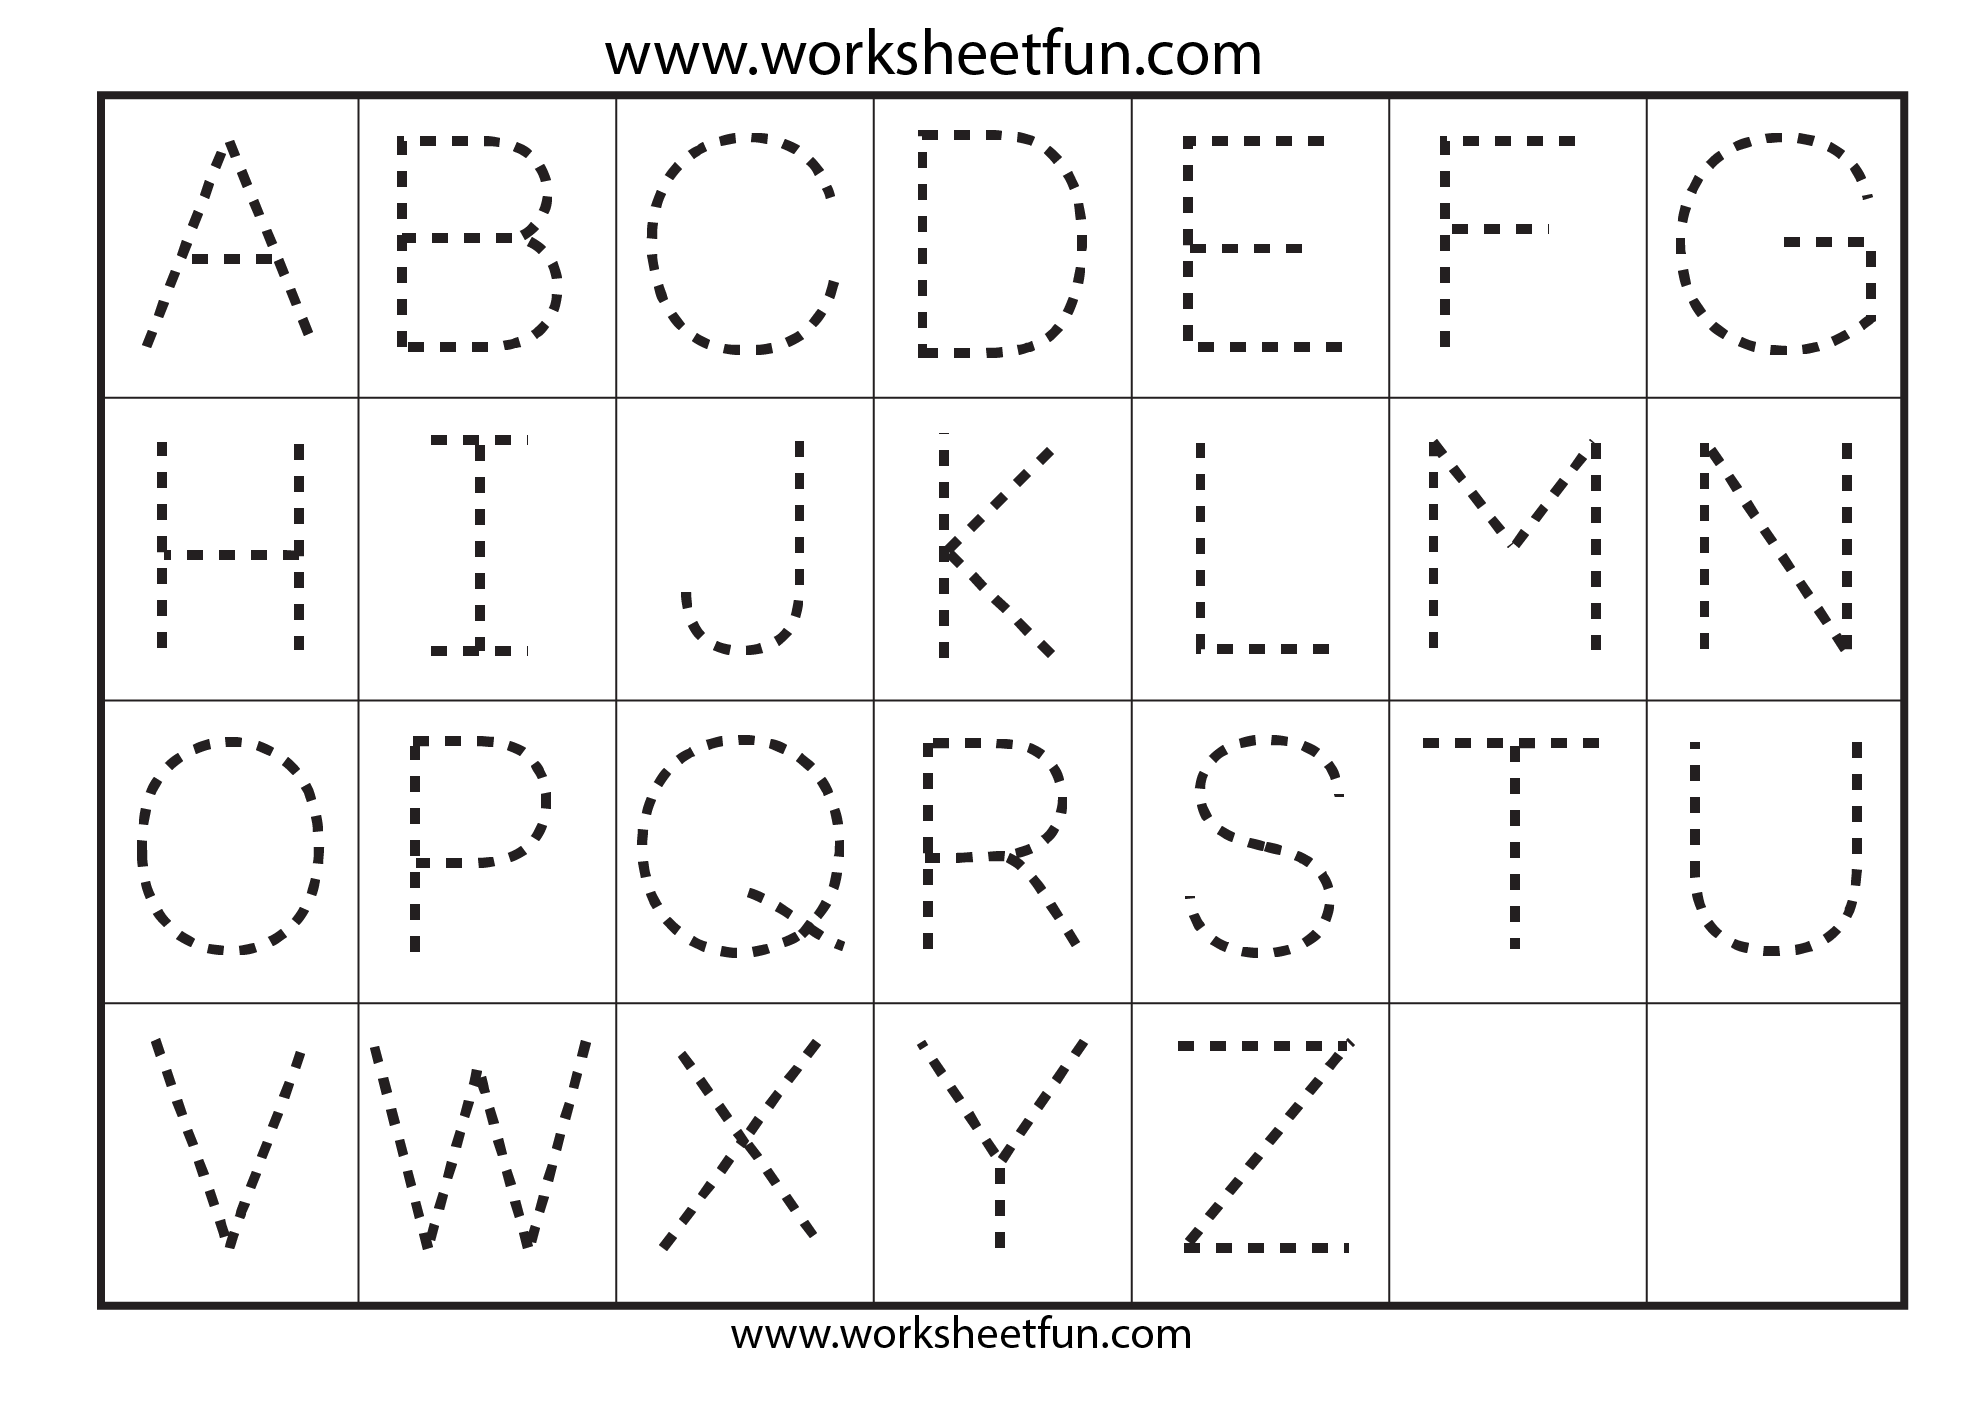 Tracing Alphabets Worksheets For The Best Worksheets Image